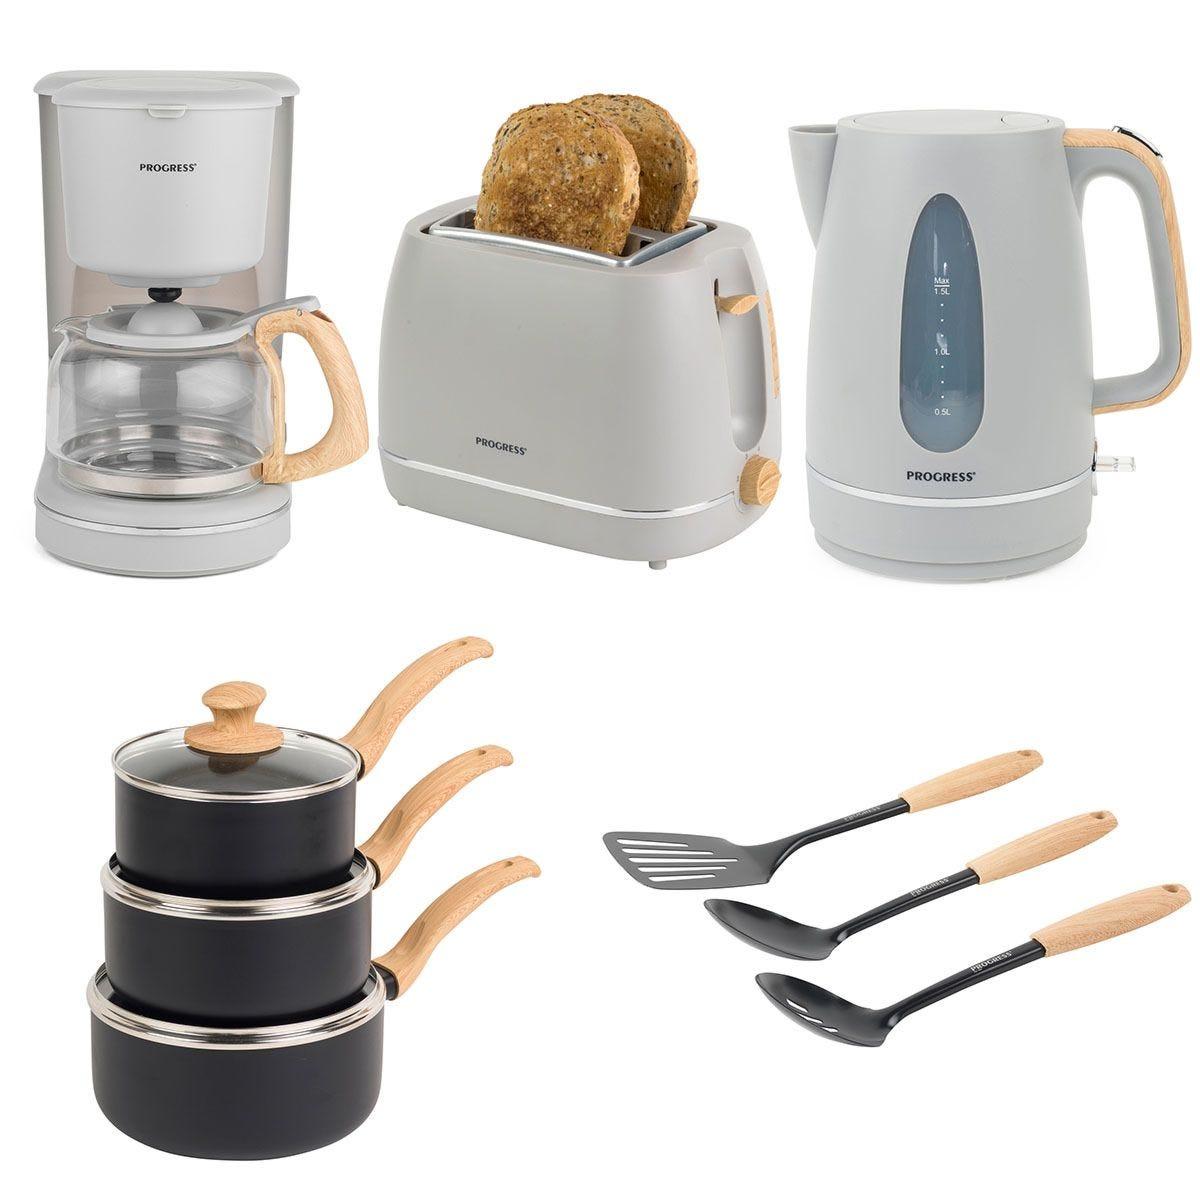 Progress® COMBO–6800 Scandi Kitchen Essentials Set – Grey and Black